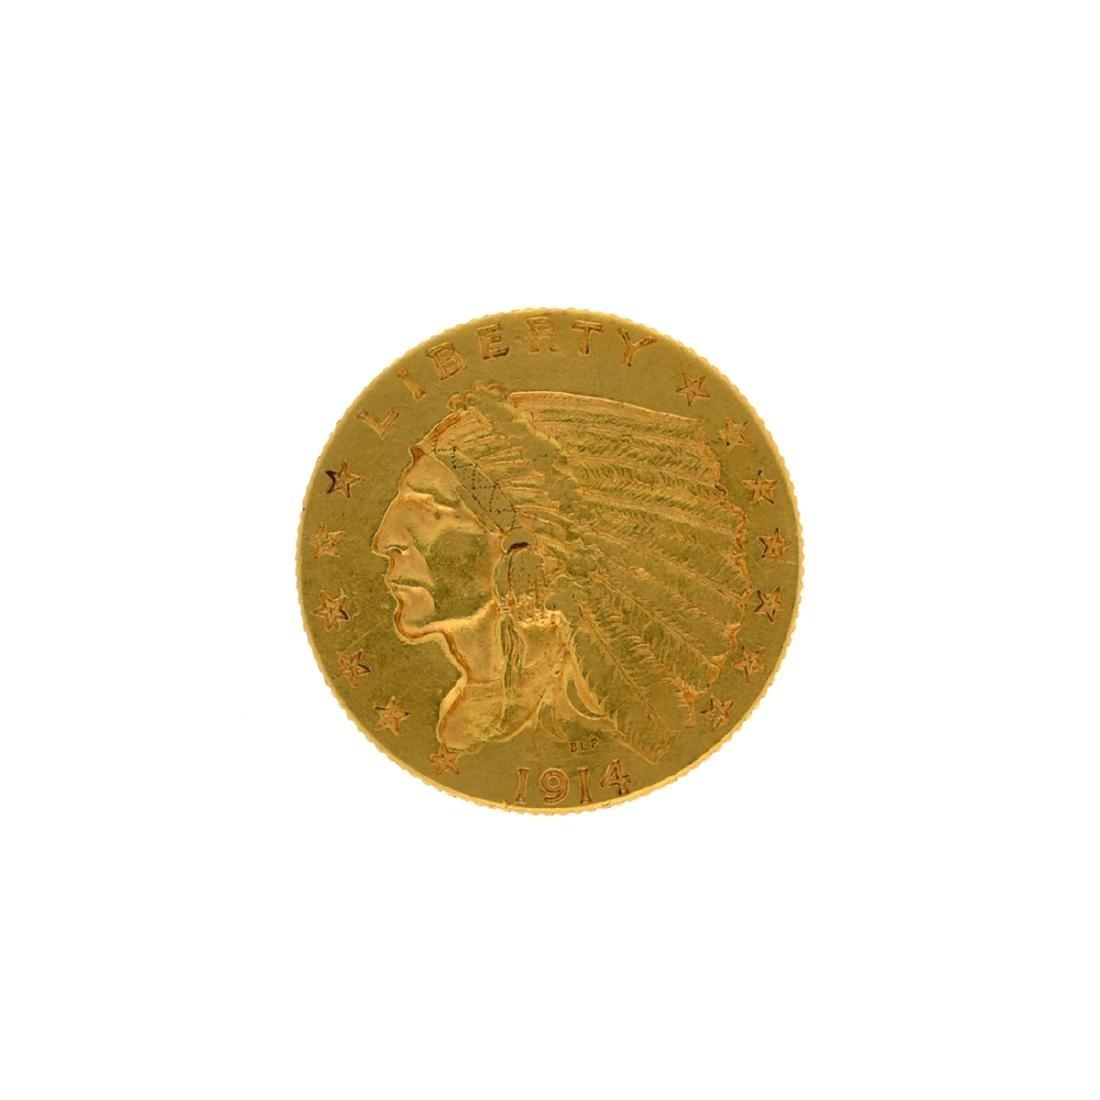 *1914-D $2.5 Indian Head Gold Coin (DF)